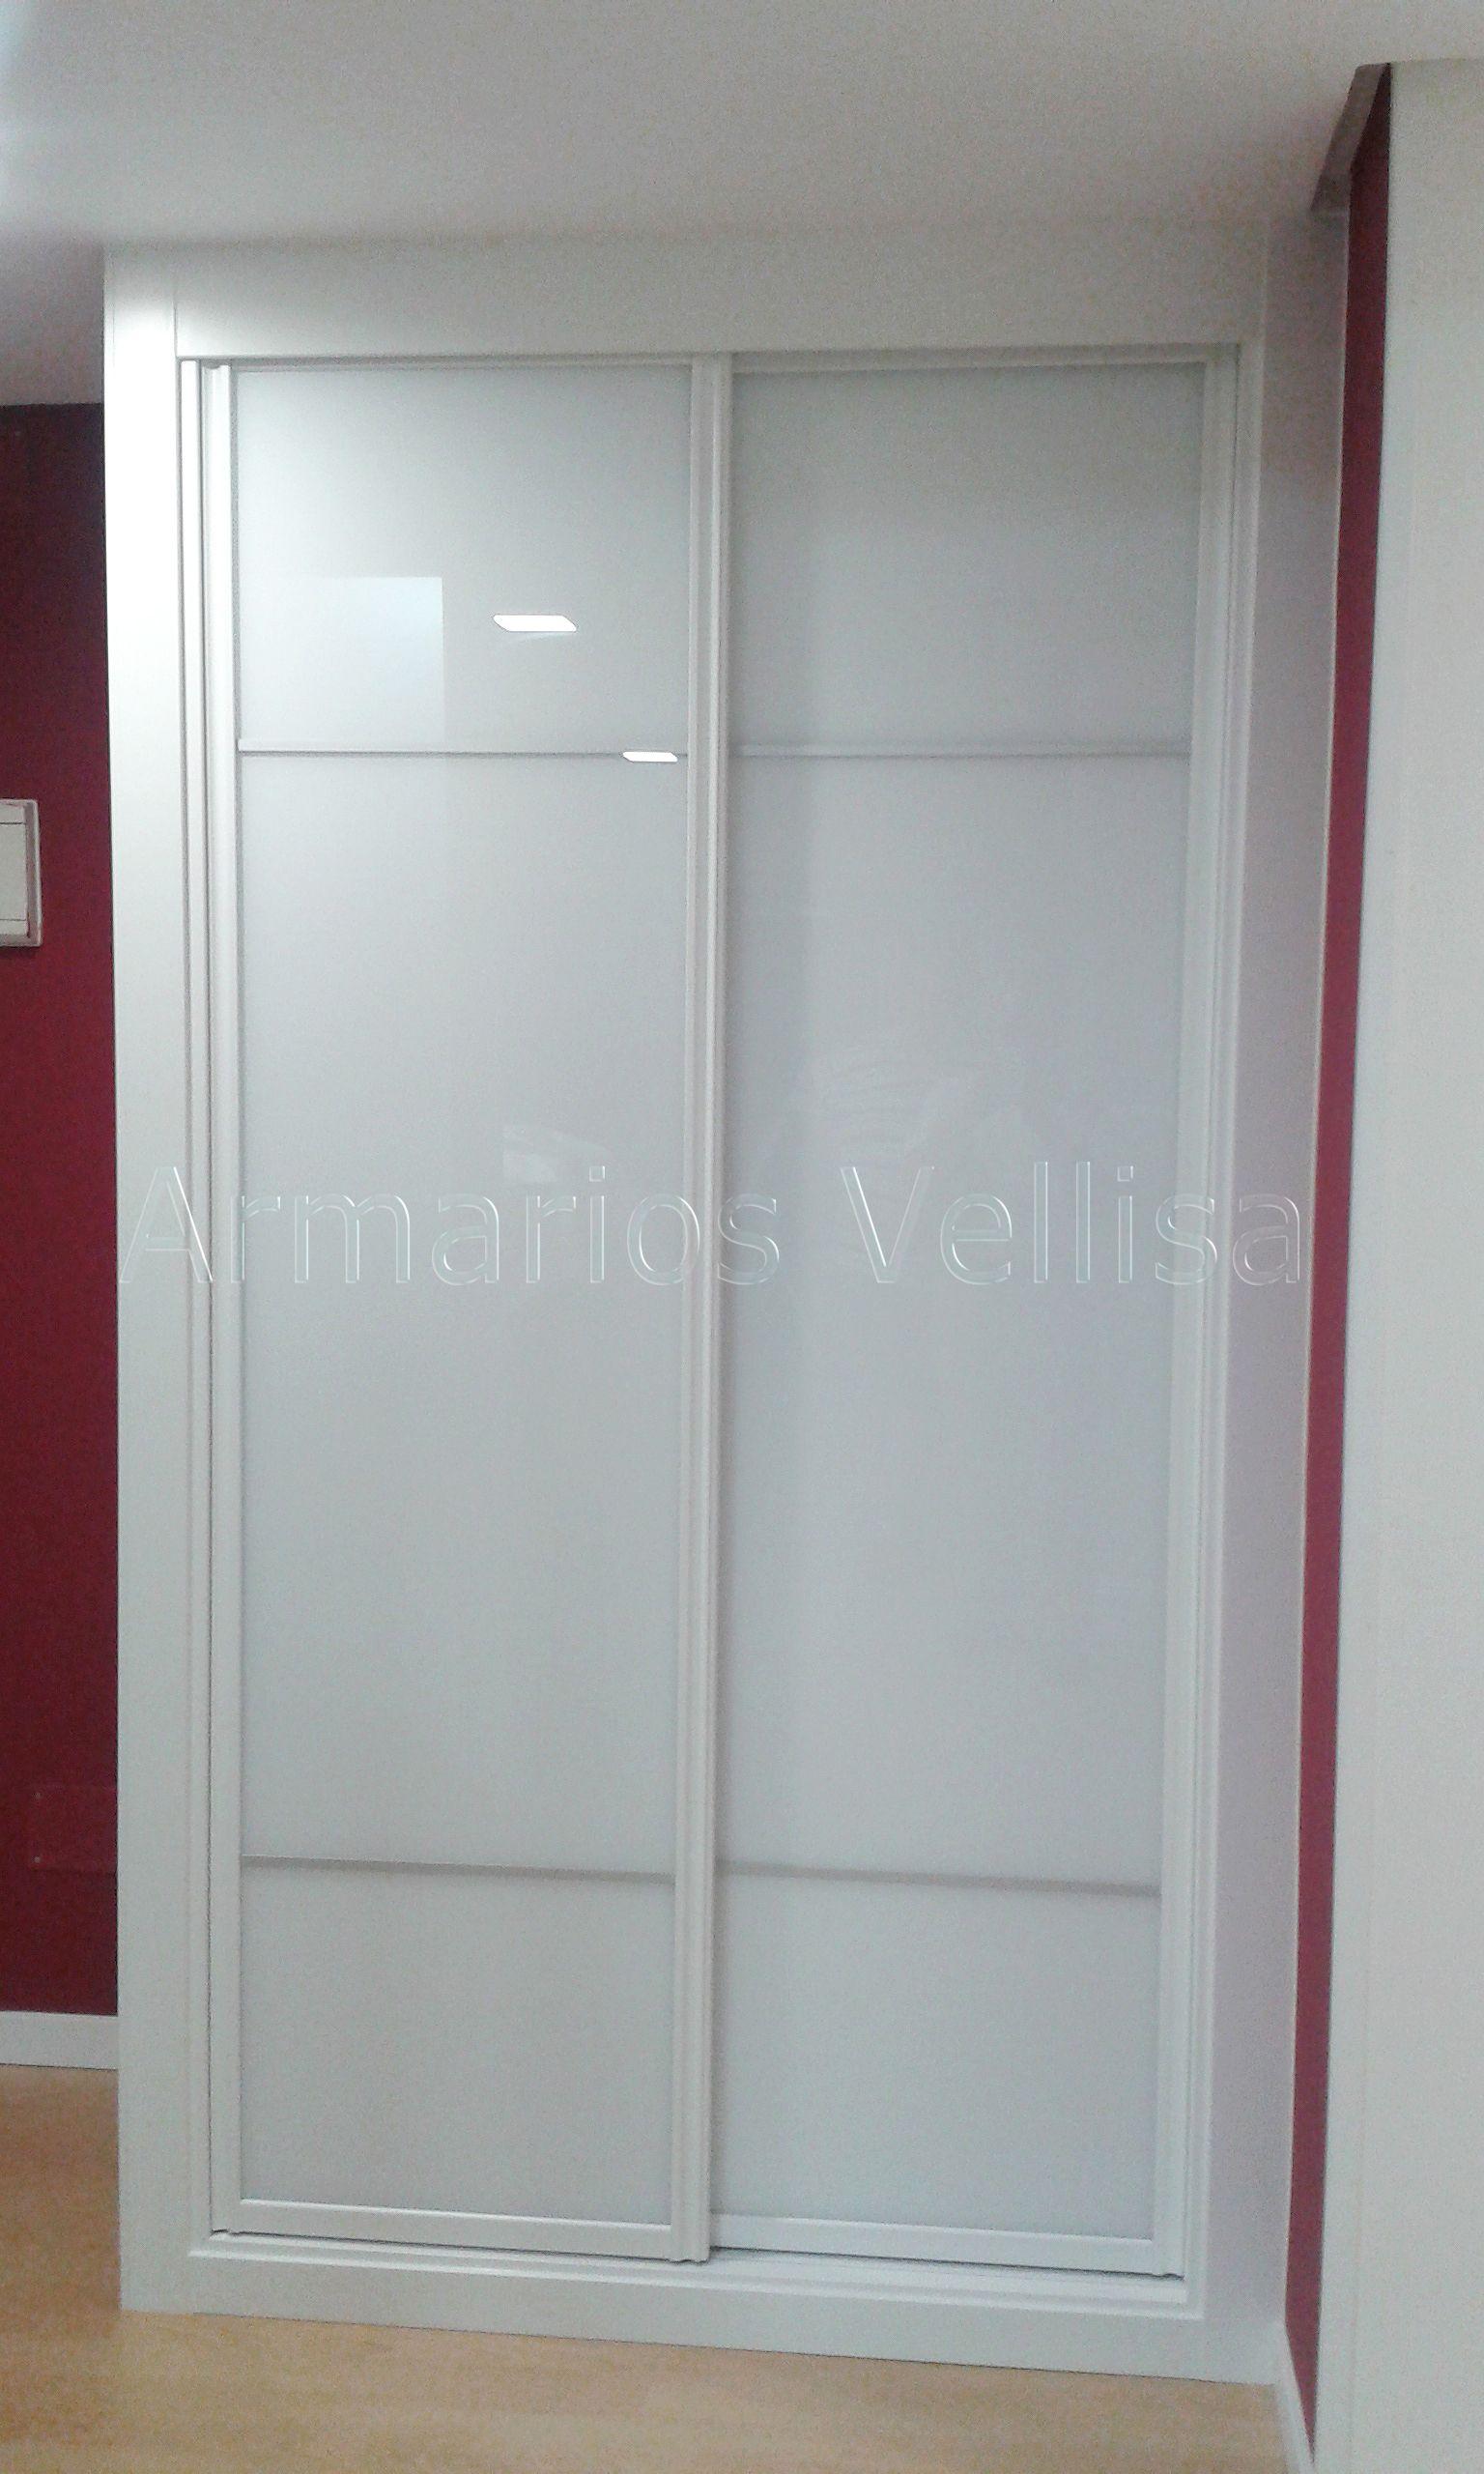 Armario empotrado en entrada vivienda 229 x 130 x 65 2 for Armario de pared con entrada equipada